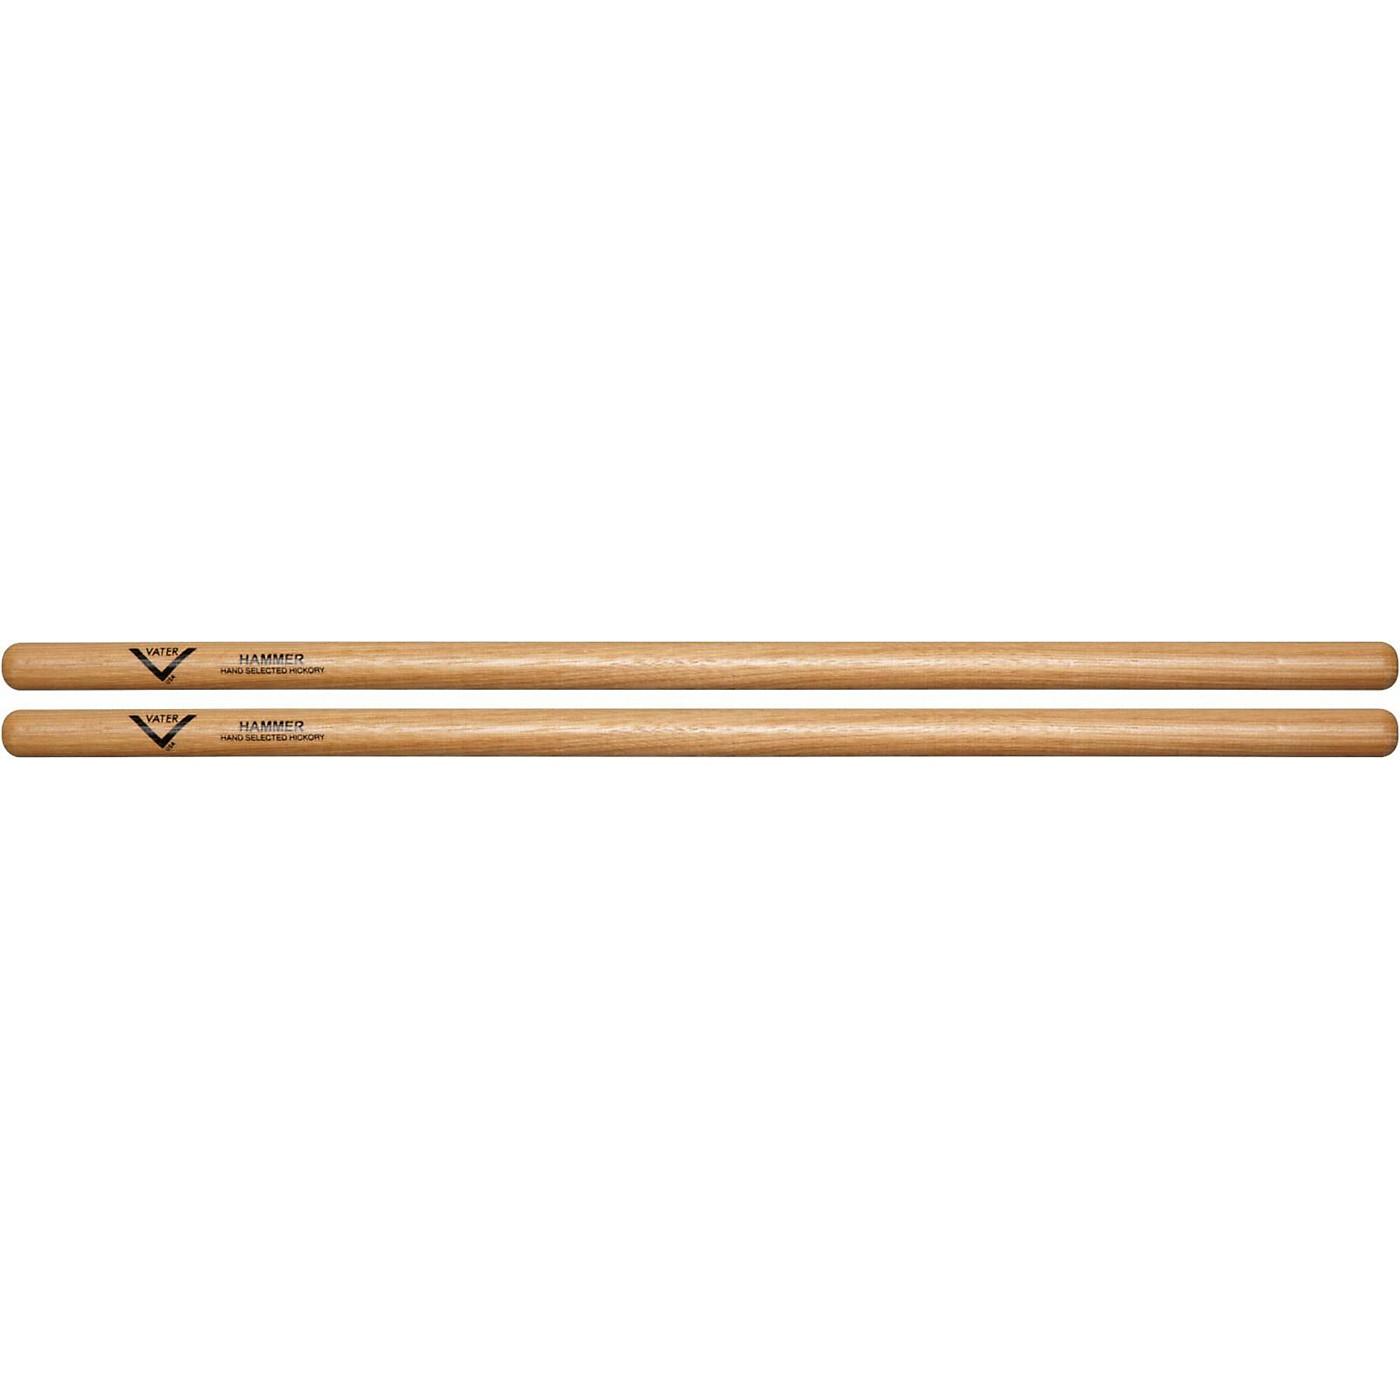 Vater American Hickory Hammer Drumsticks thumbnail